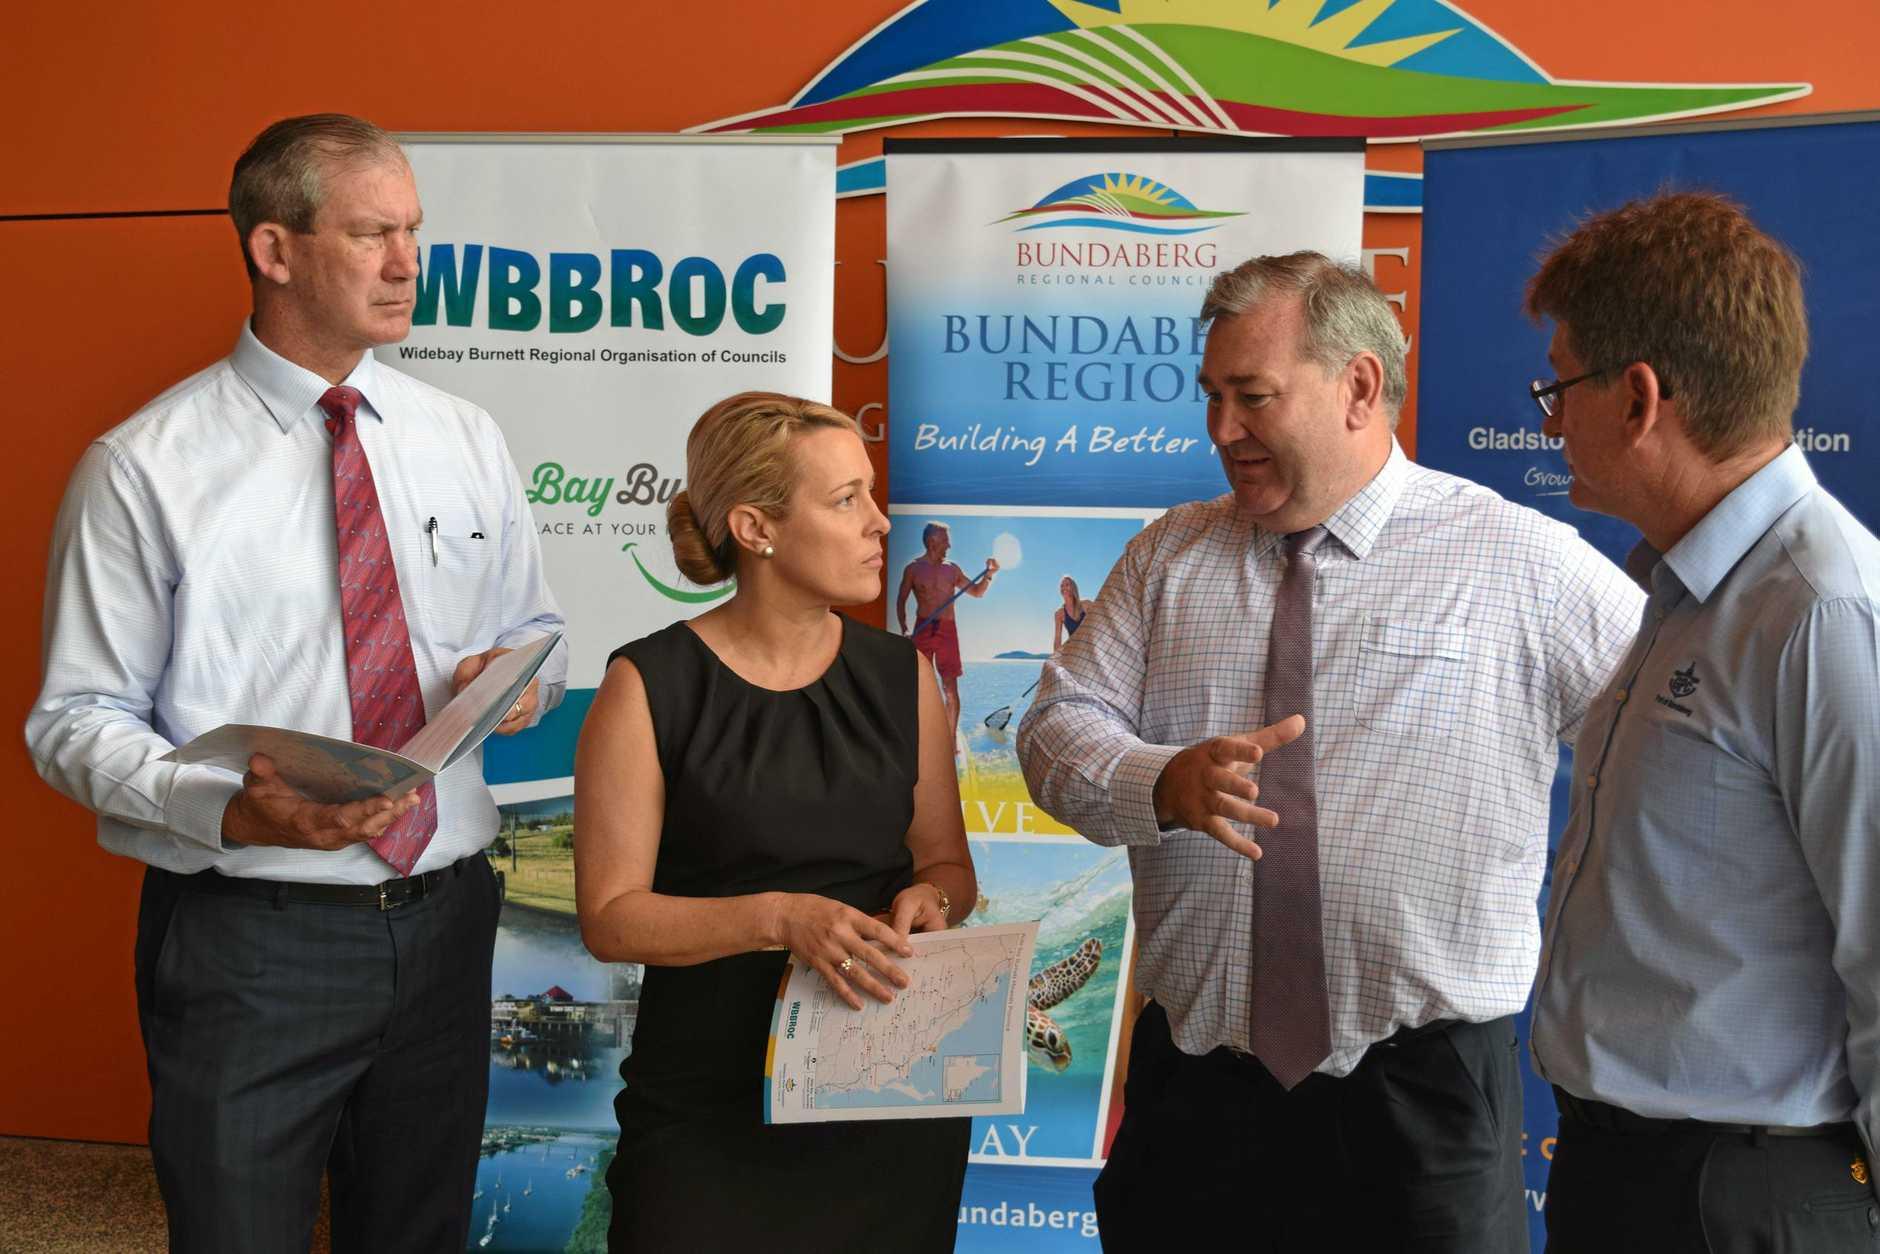 ECONOMIC GROWTH FORUM: Gympie Mayor Mick Curran (Chair of WBBROC), North Burnett Mayor Rachel Chambers, Bundaberg Mayor Jack Dempsey and Manager of Bundaberg Port (GPC) Jason Pascoe.